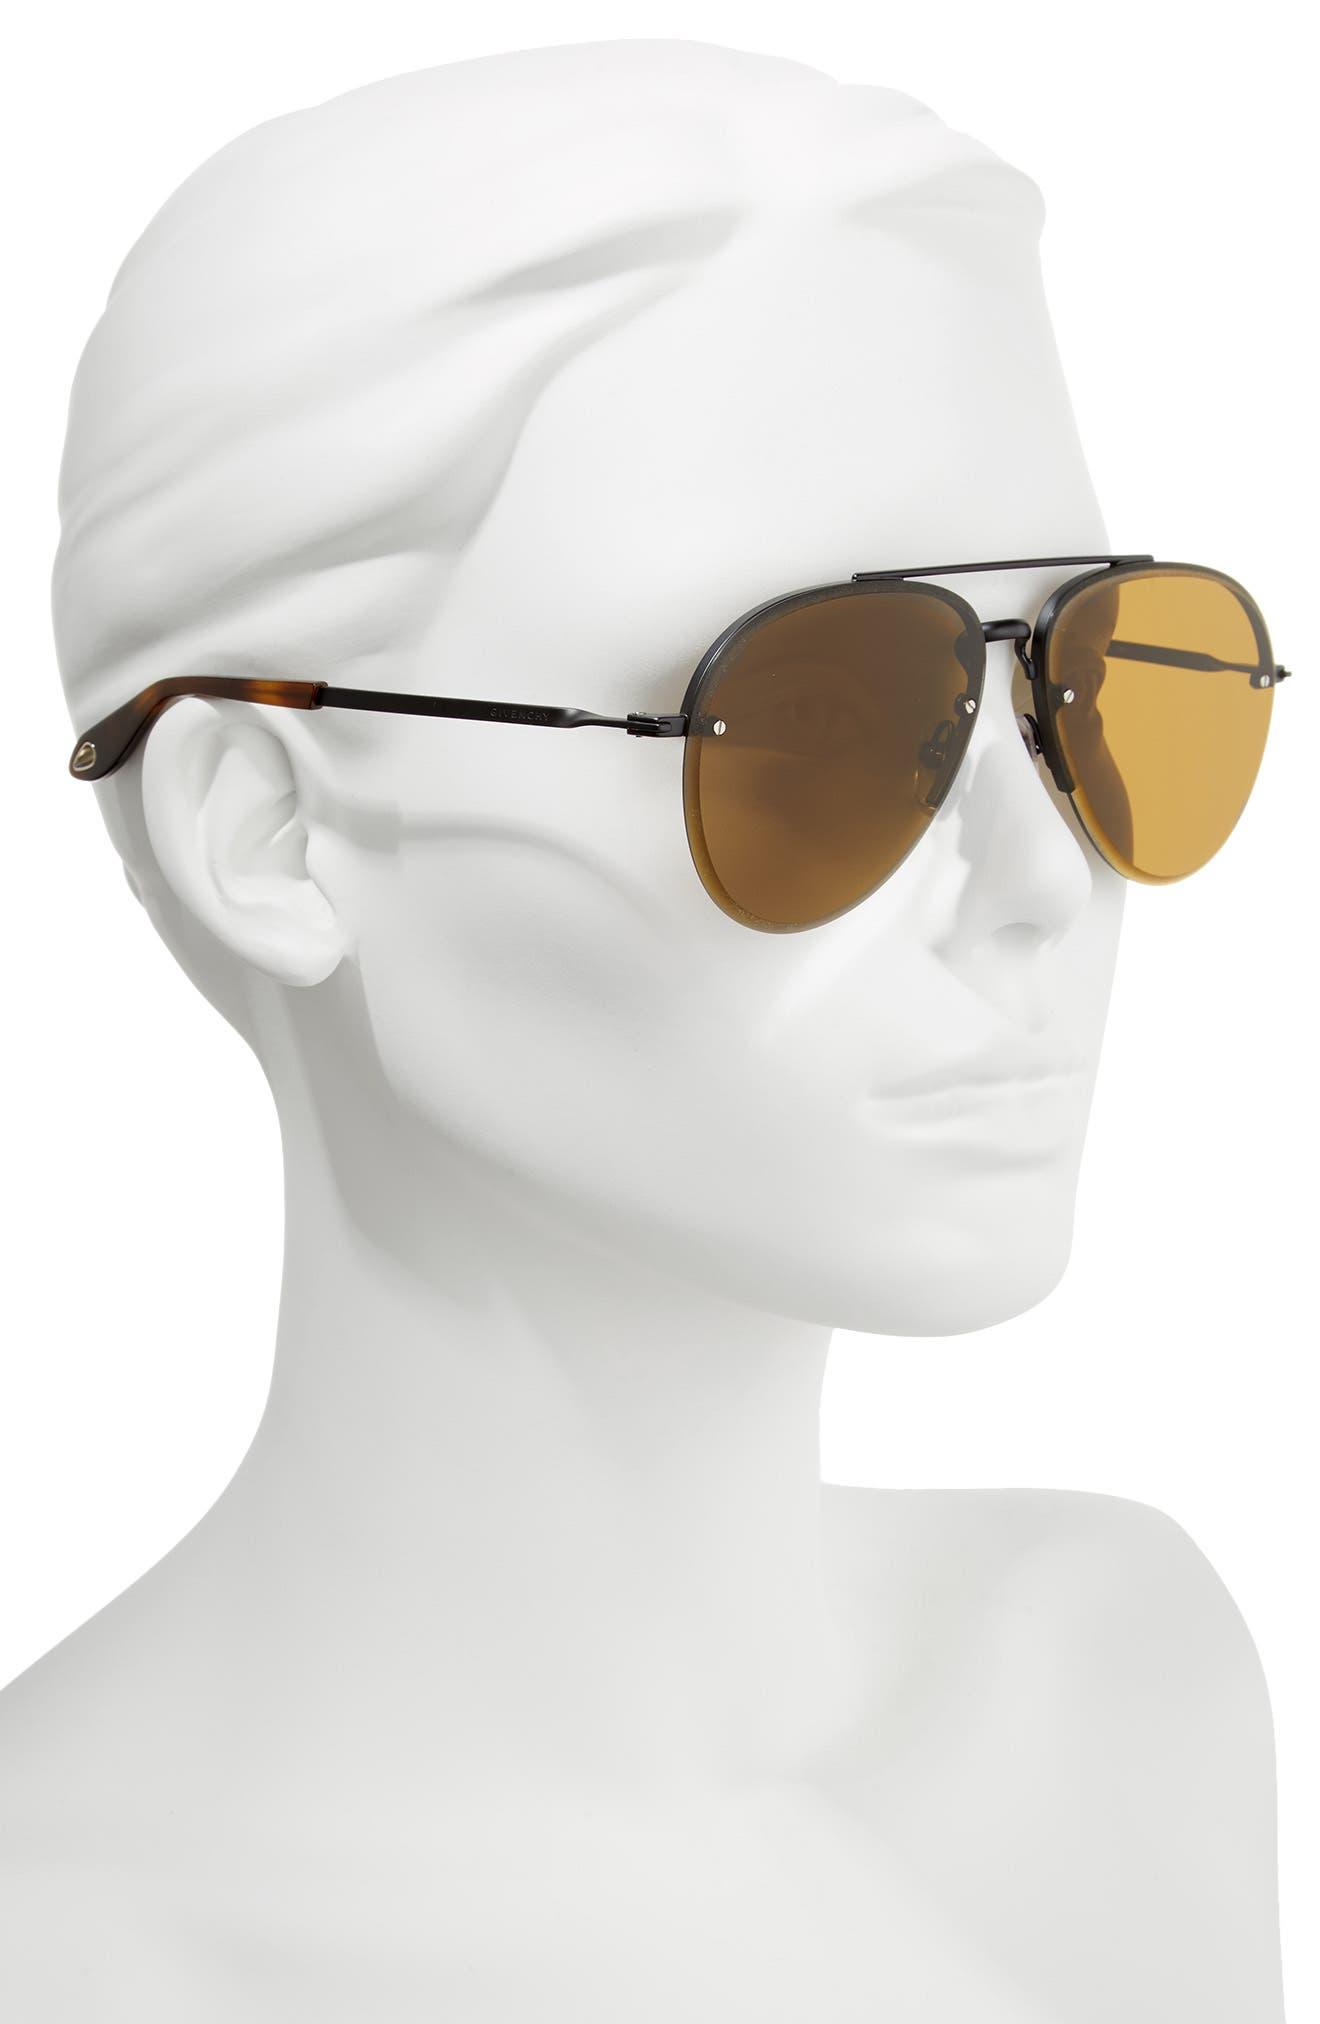 62mm Oversize Aviator Sunglasses,                             Alternate thumbnail 2, color,                             001